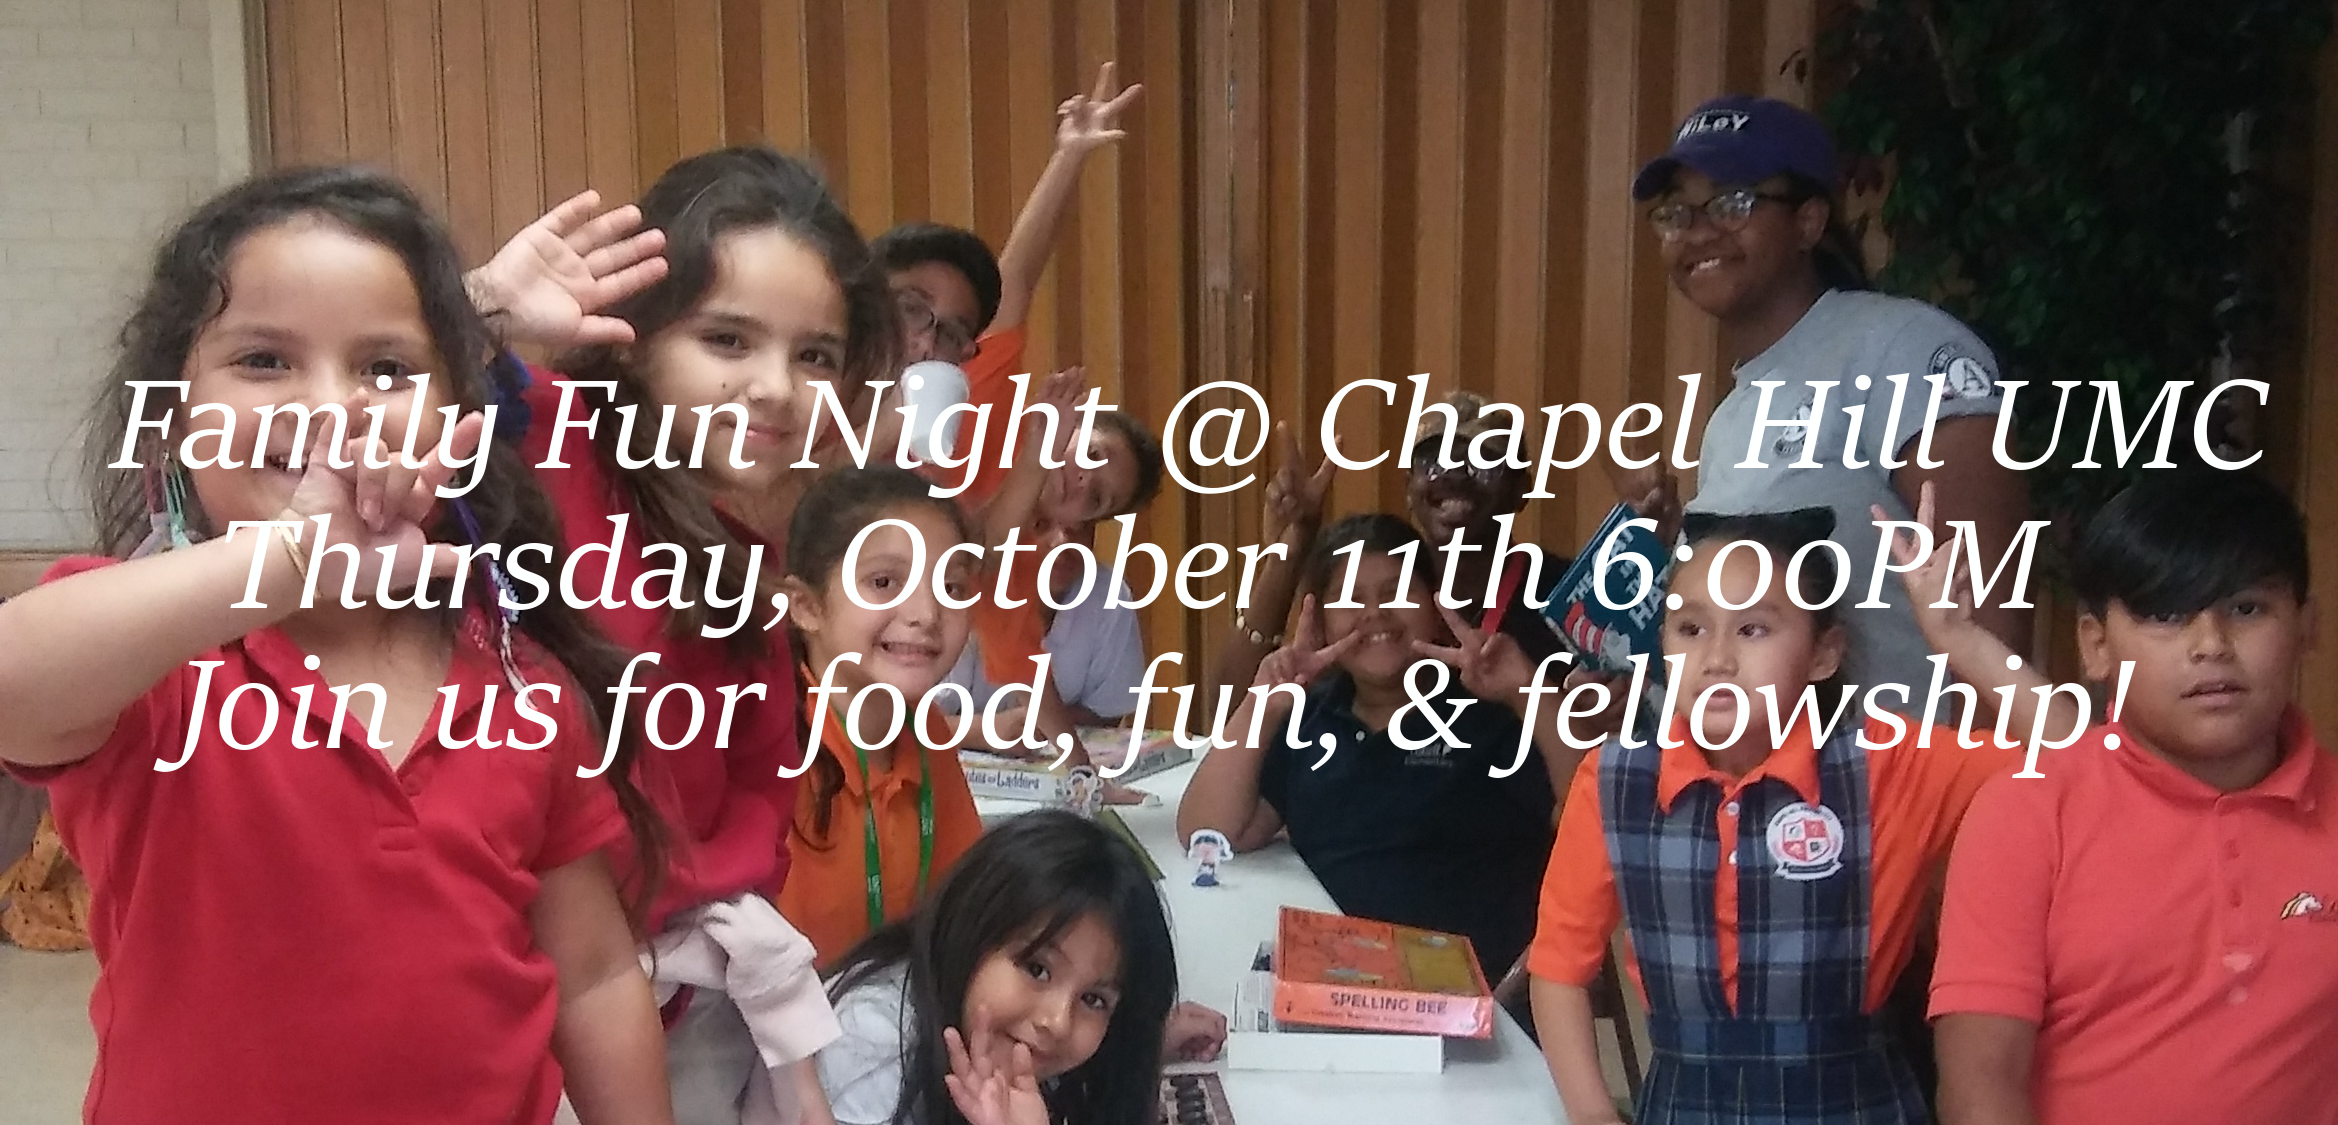 Chapel Hill UMC Family Fun Night!